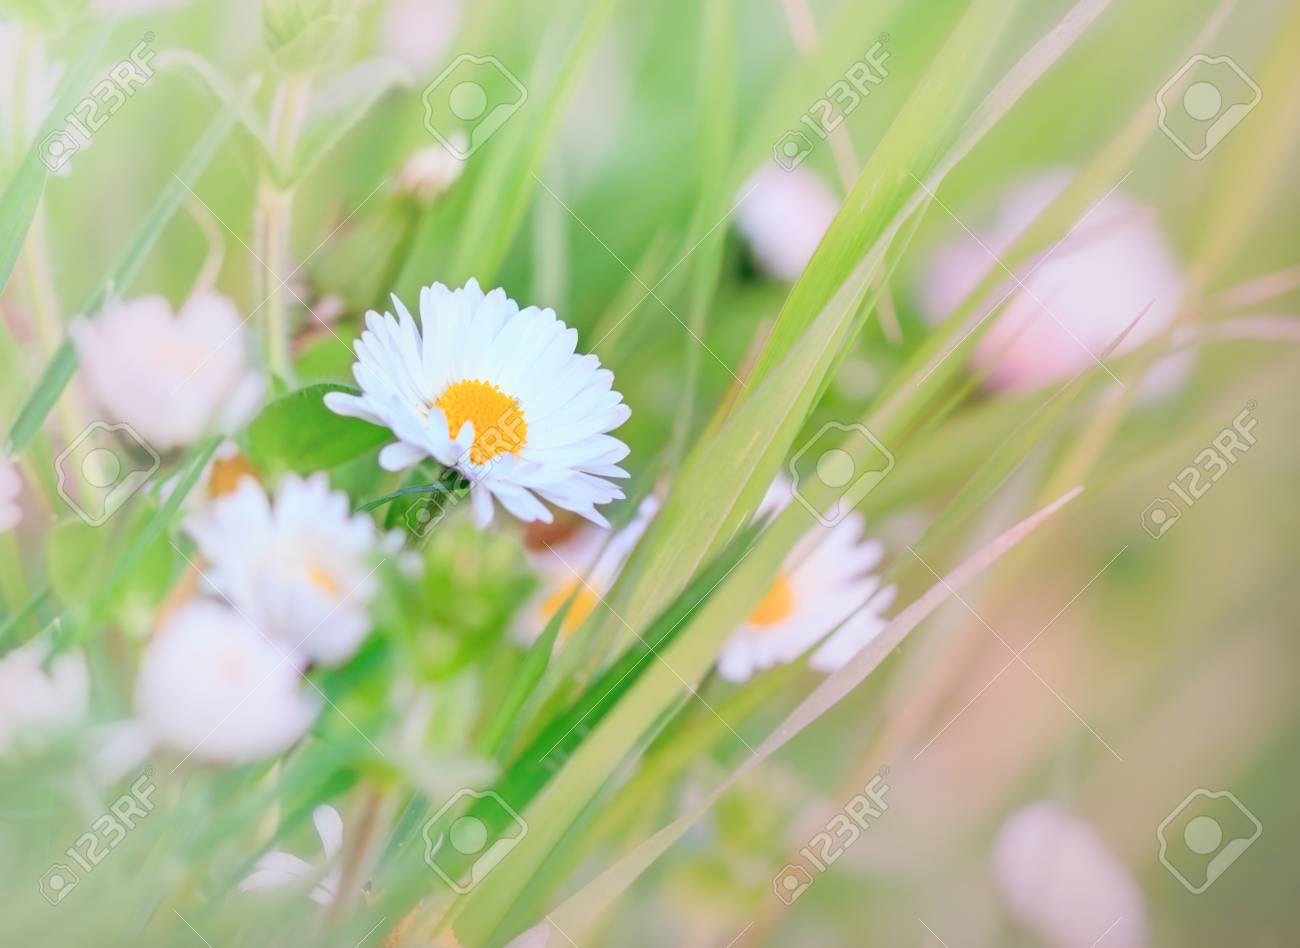 Beautiful daisy flowers in meadow stock photo picture and royalty beautiful daisy flowers in meadow stock photo 45693575 izmirmasajfo